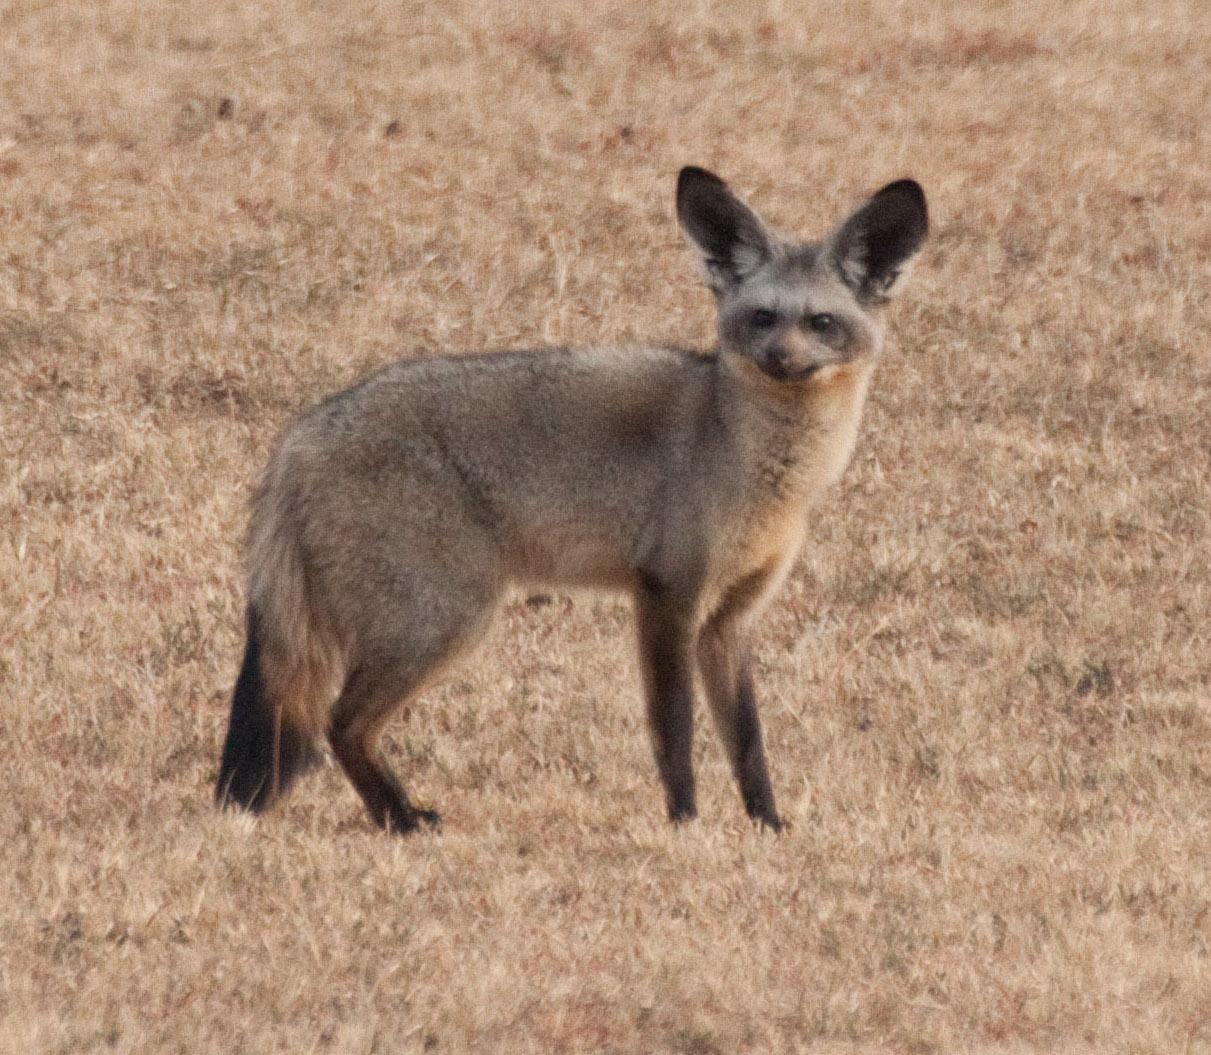 Bat eared fox - photo#2